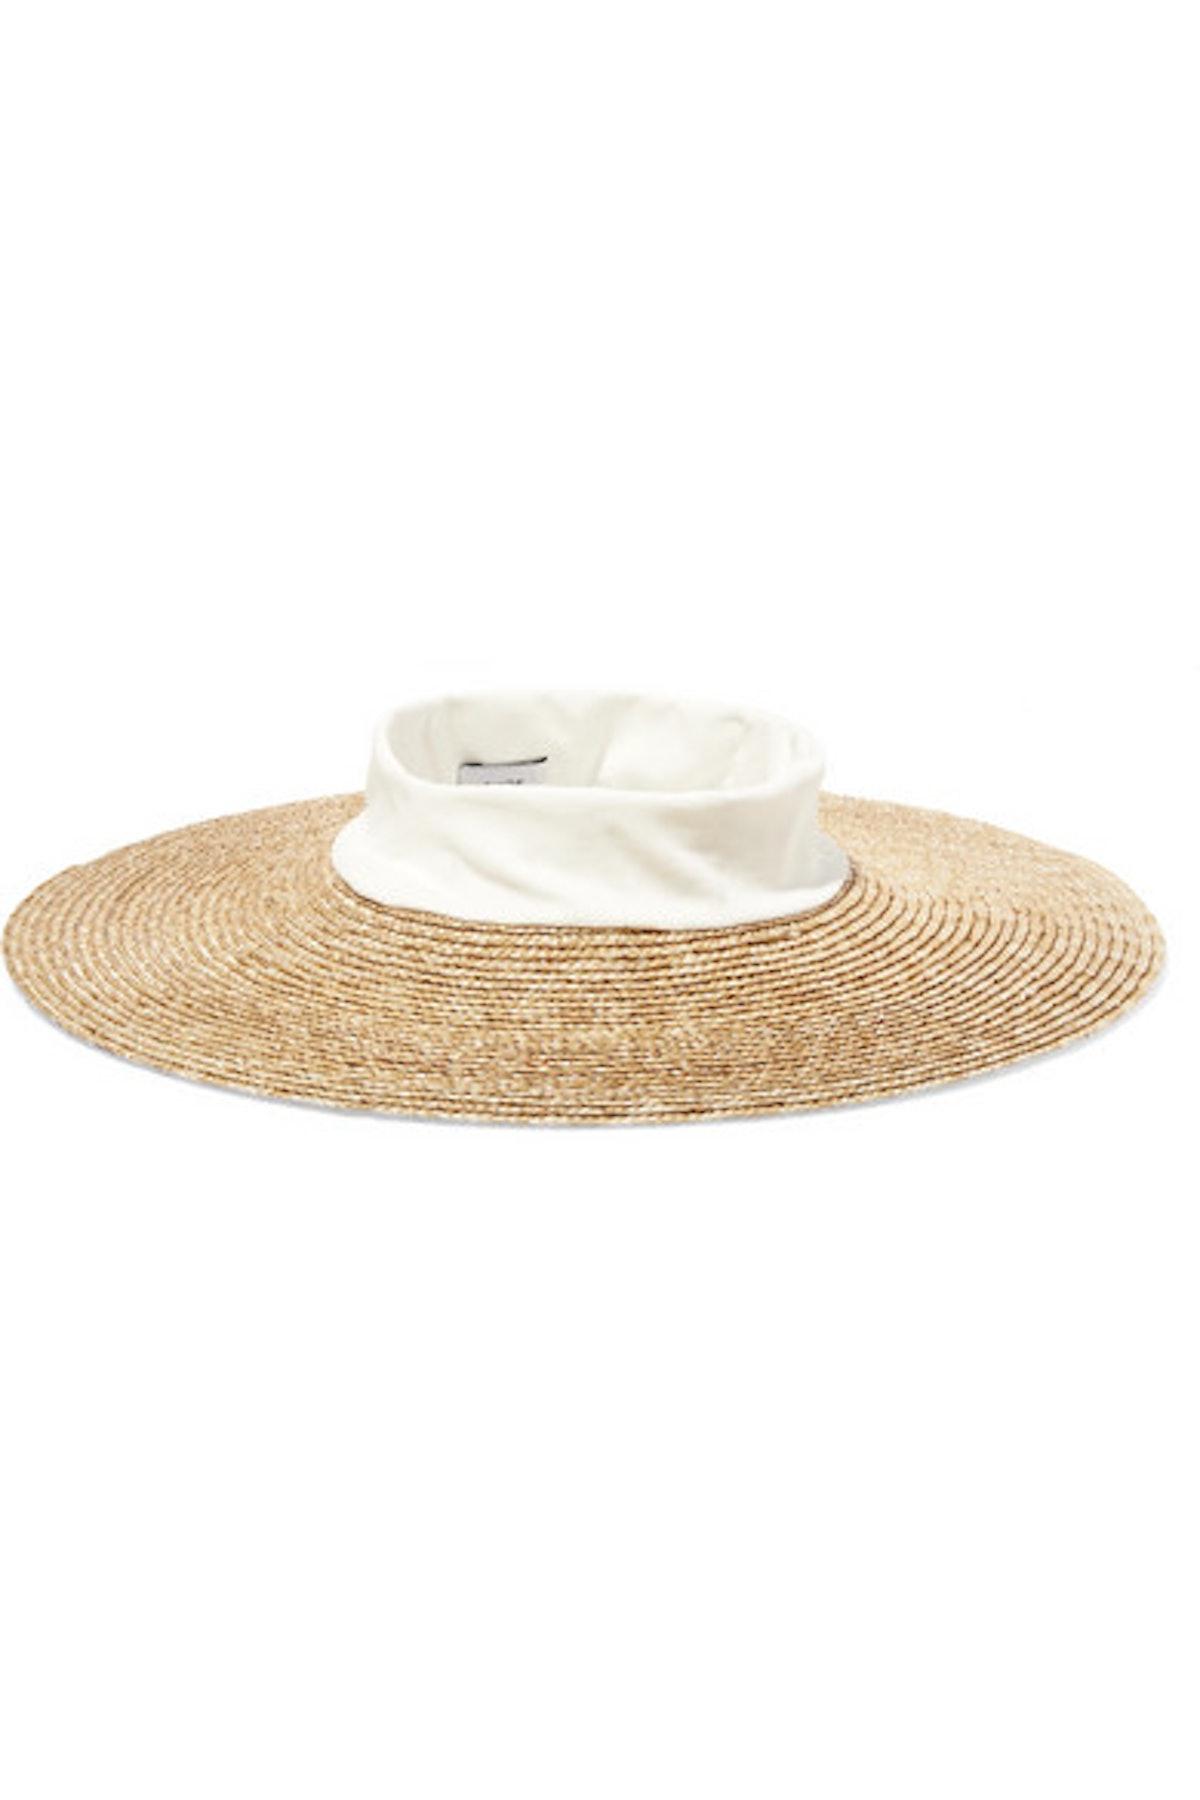 Dream Straw Hat